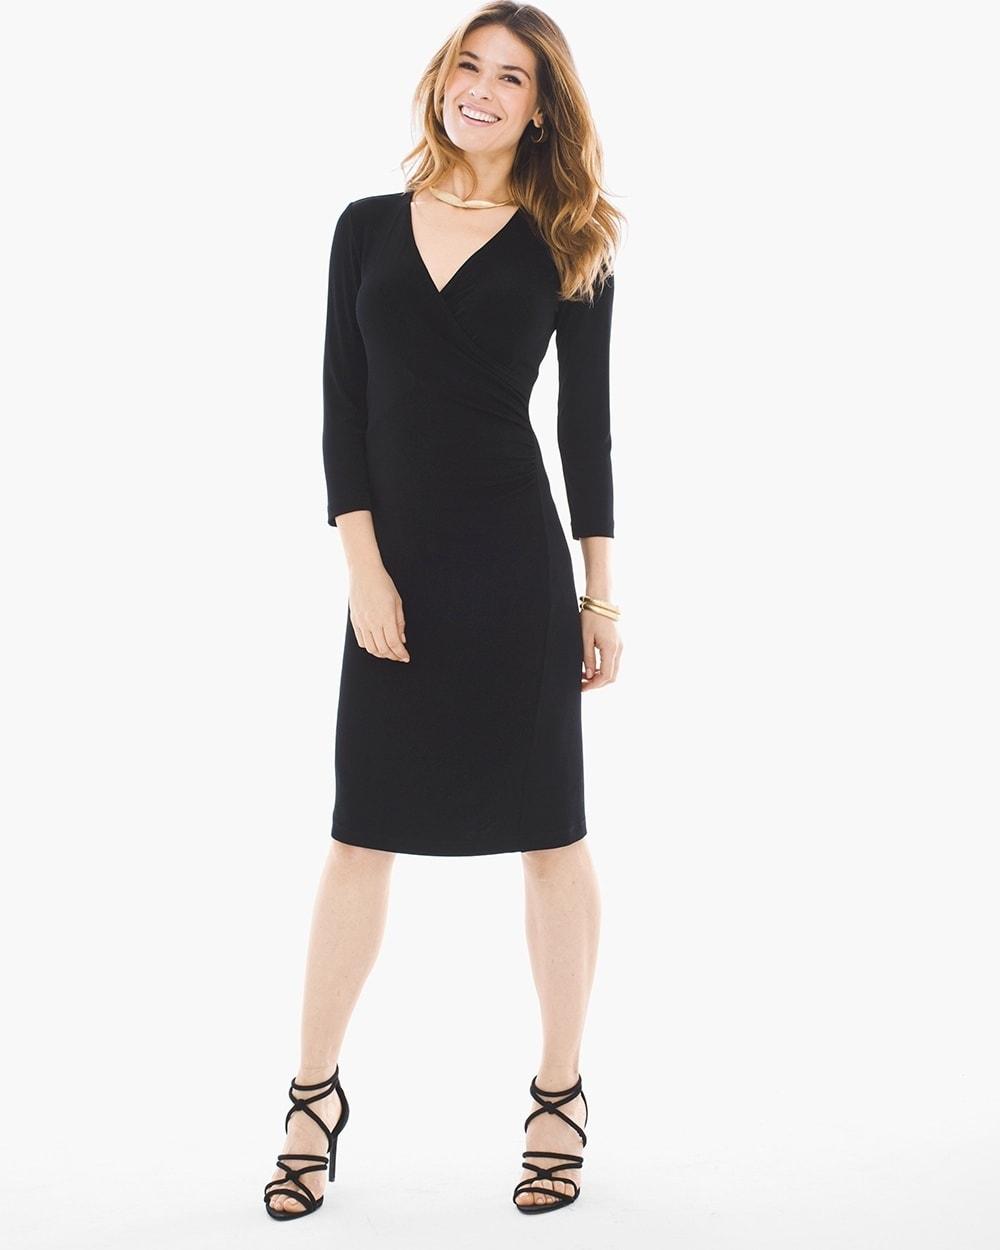 Black Wrap Dresses